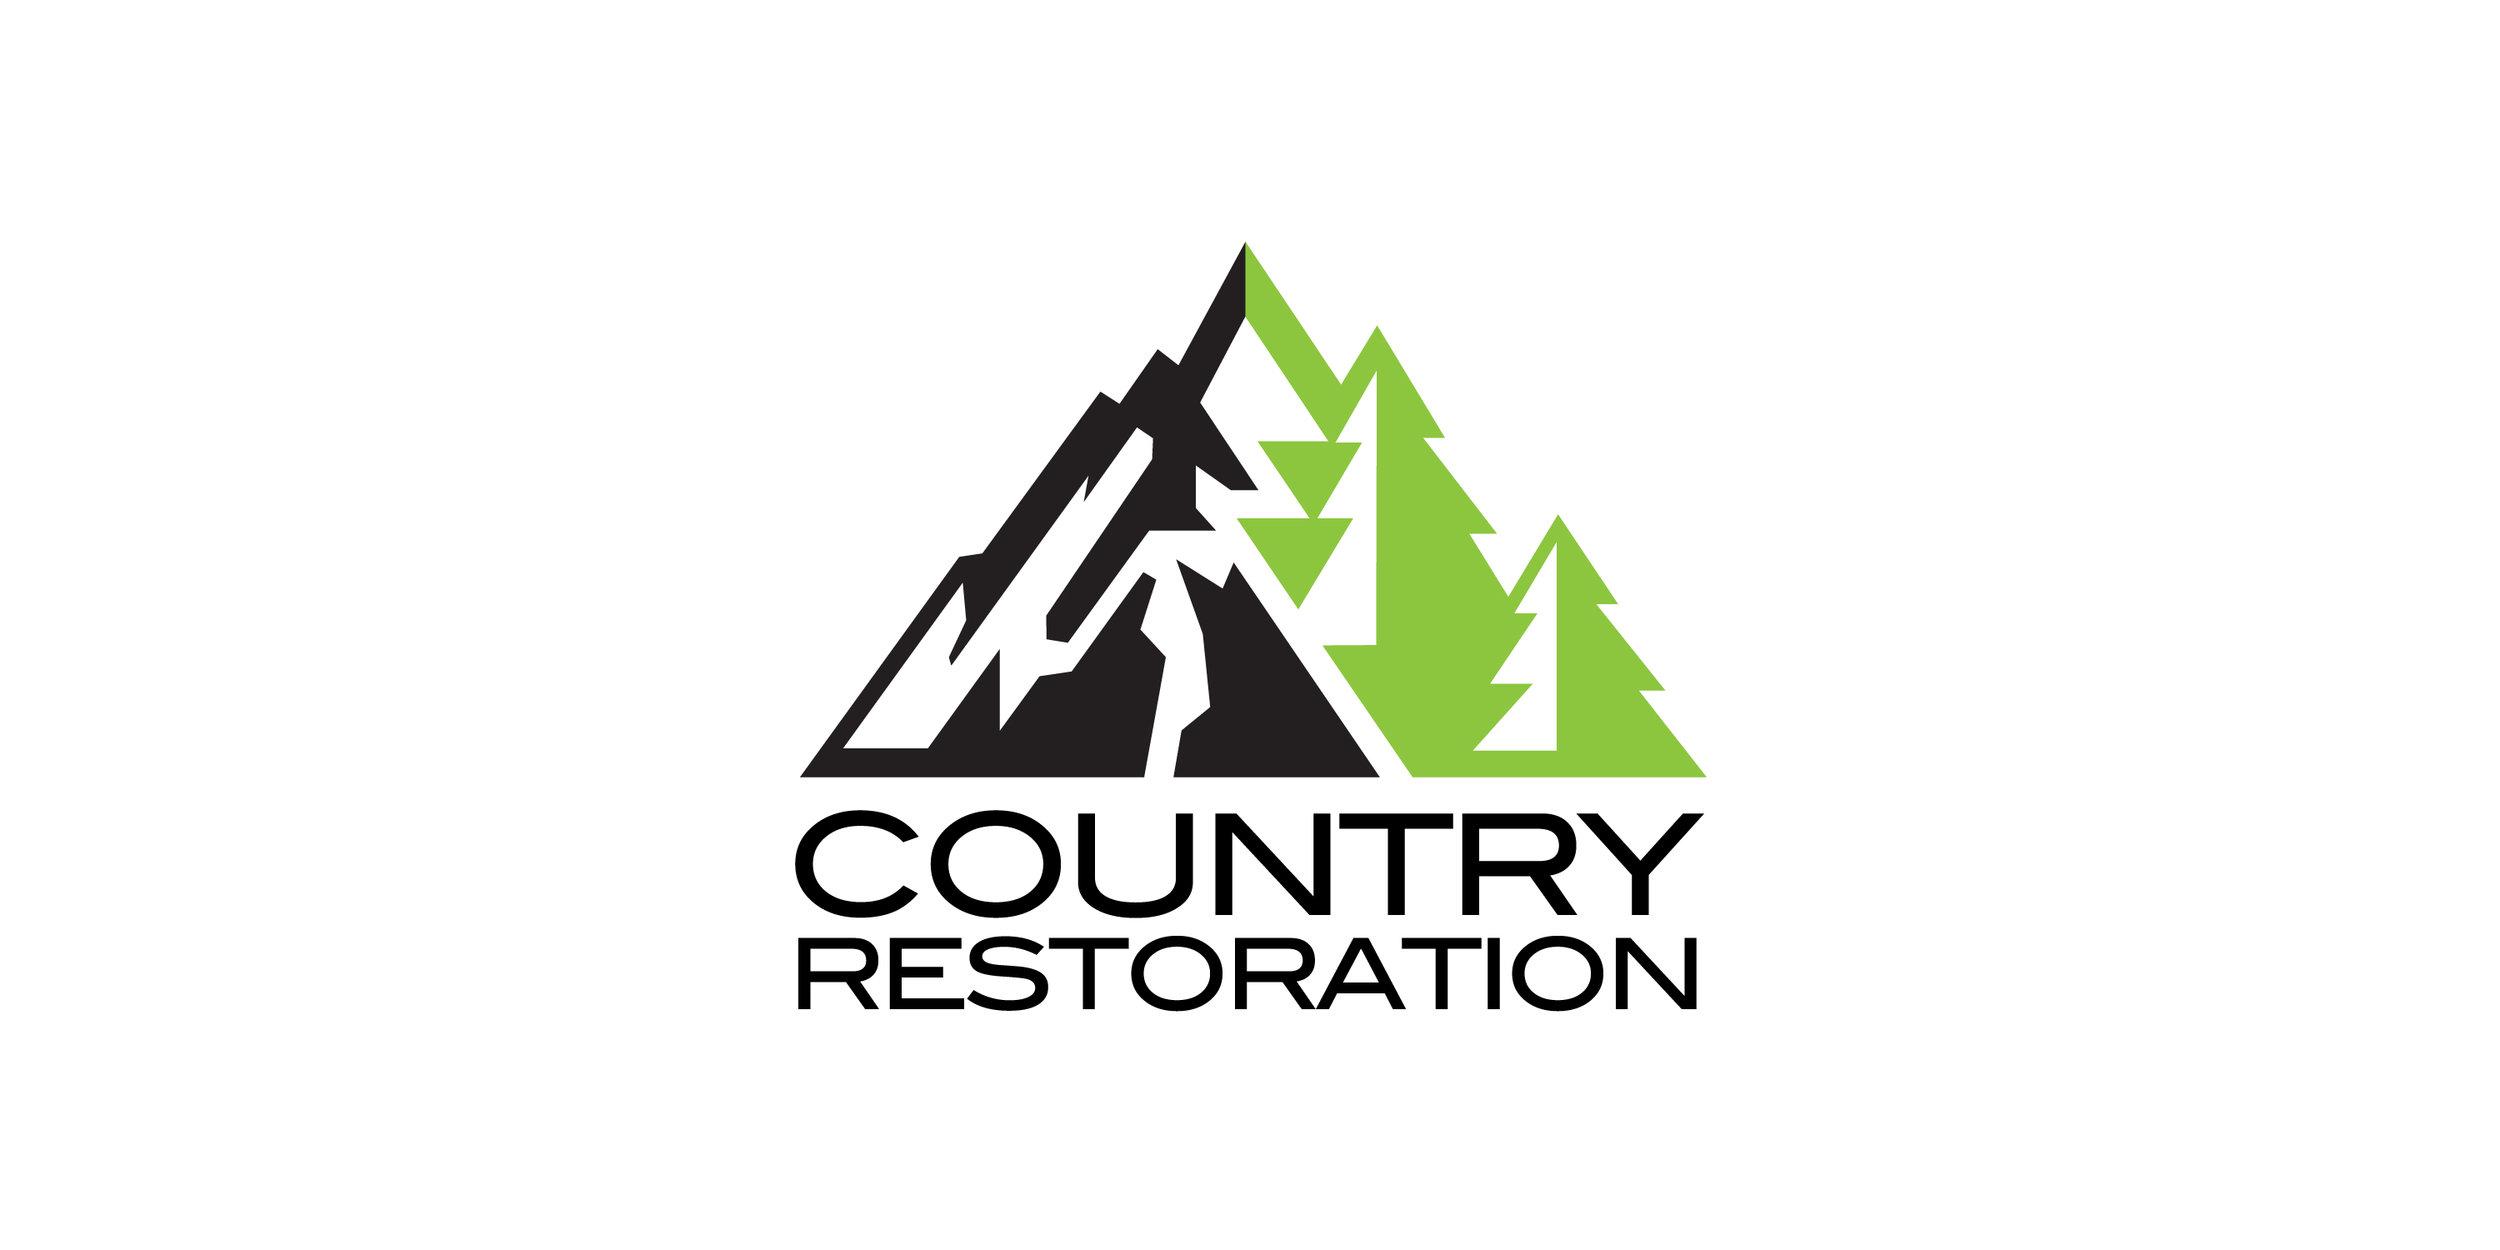 Country_Restoration_4.jpg